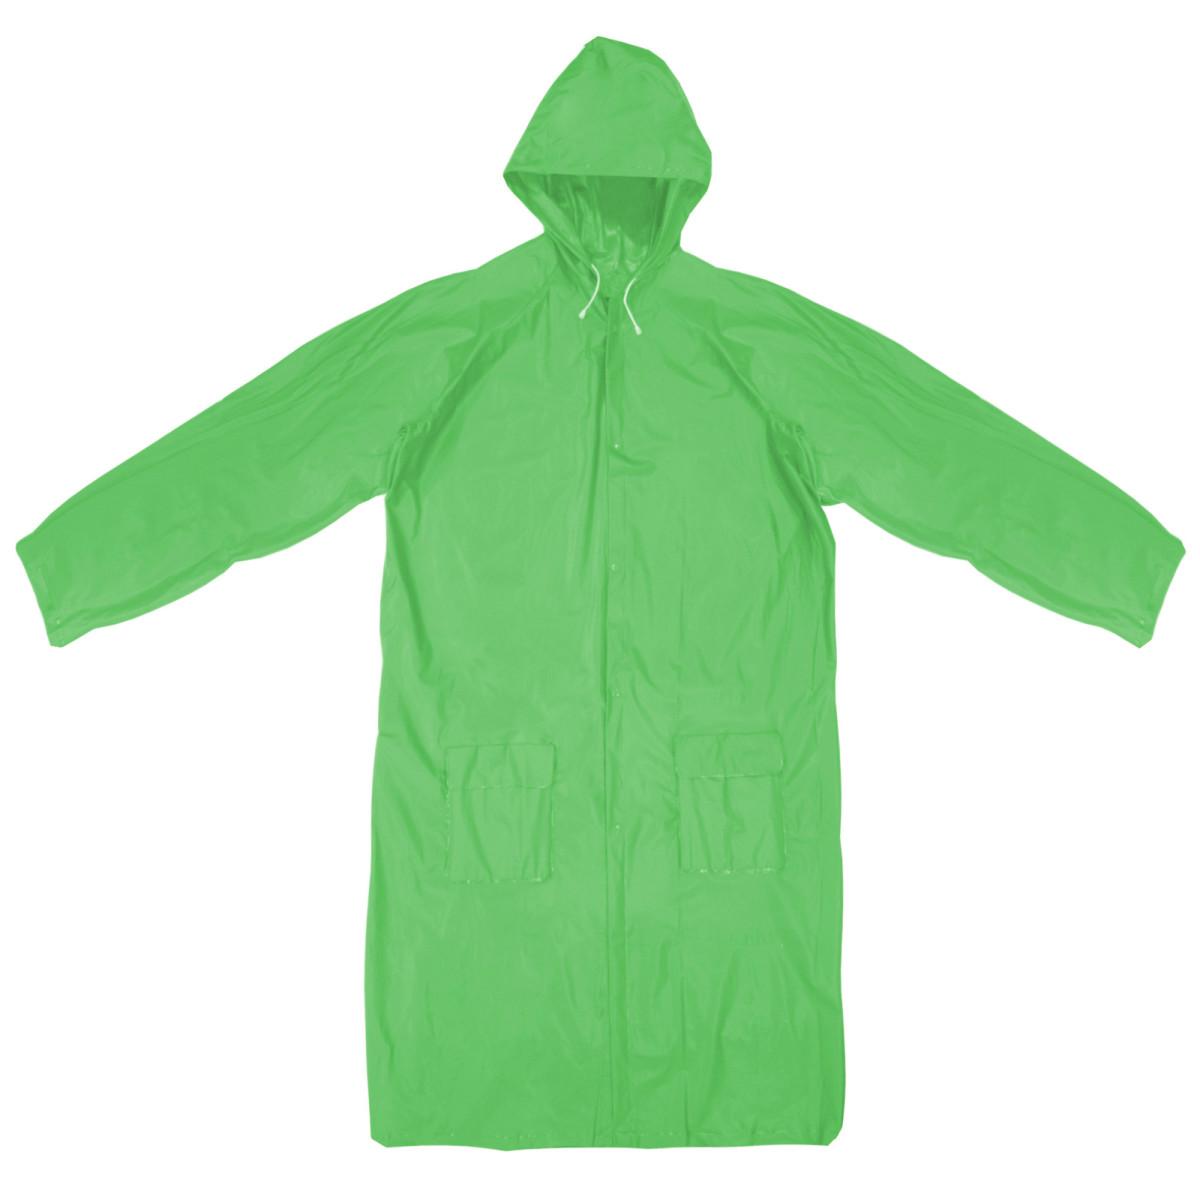 Плащ-дождевик размер S цвет зеленый